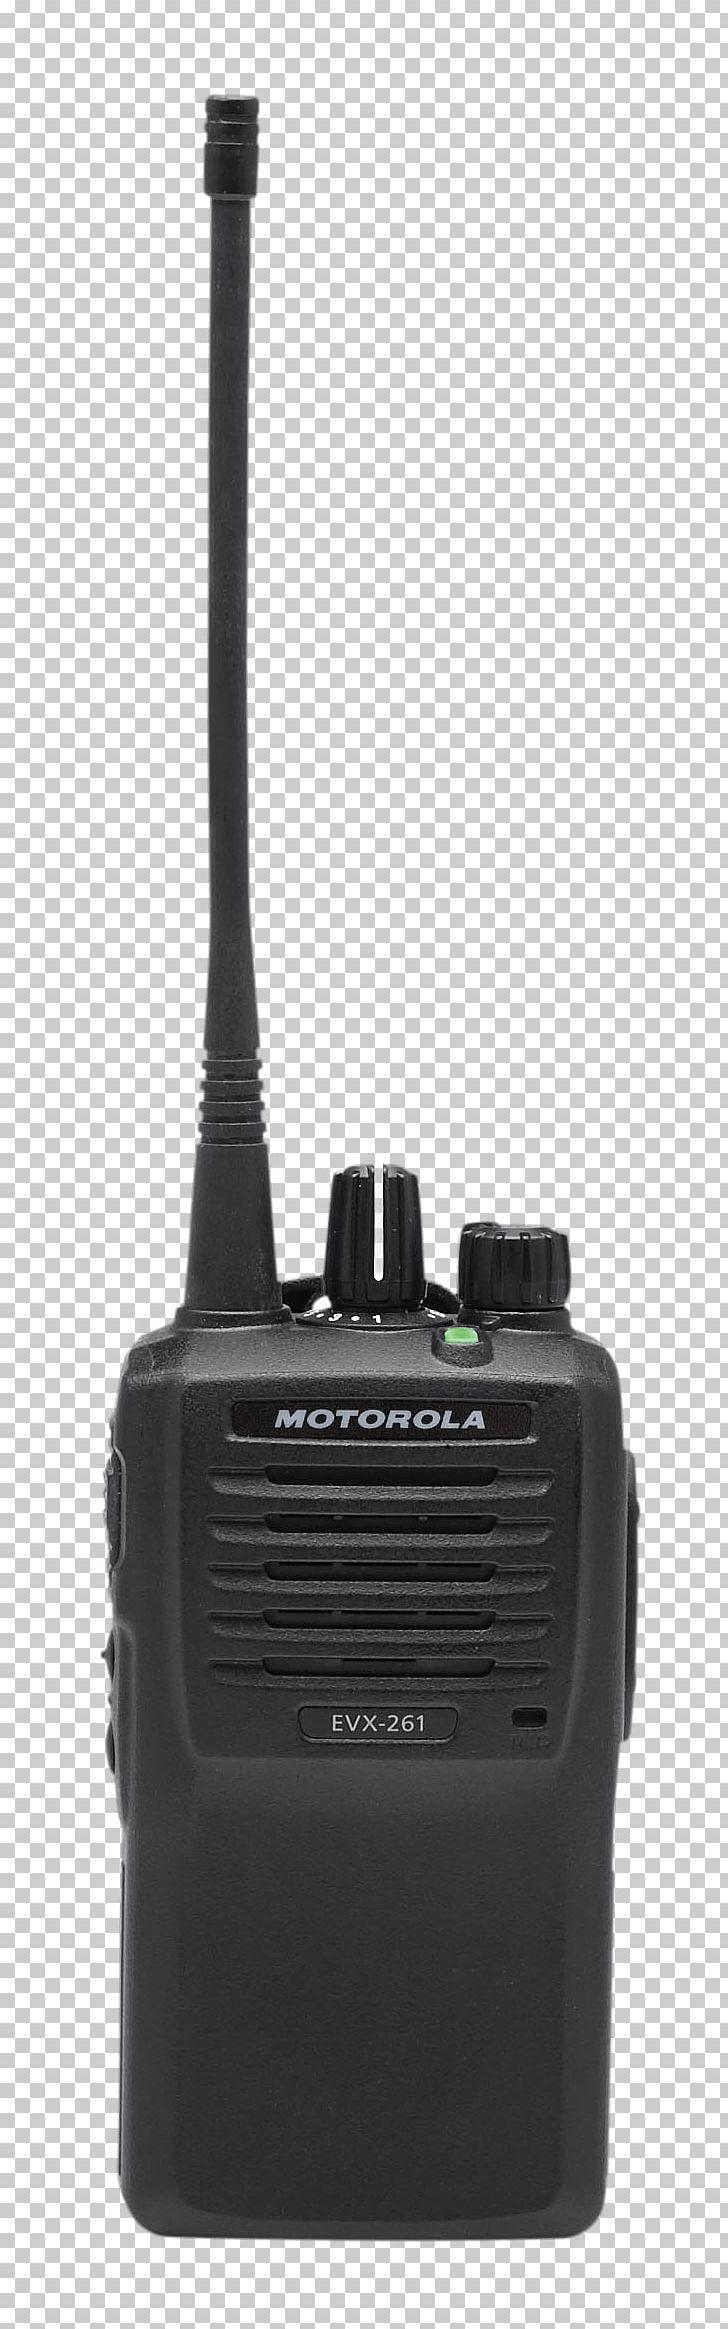 Two-way Radio PMR446 Walkie-talkie Digital Mobile Radio PNG, Clipart, Airband, Digital, Digital Mobile Radio, Electronic Device, Electronics Free PNG Download